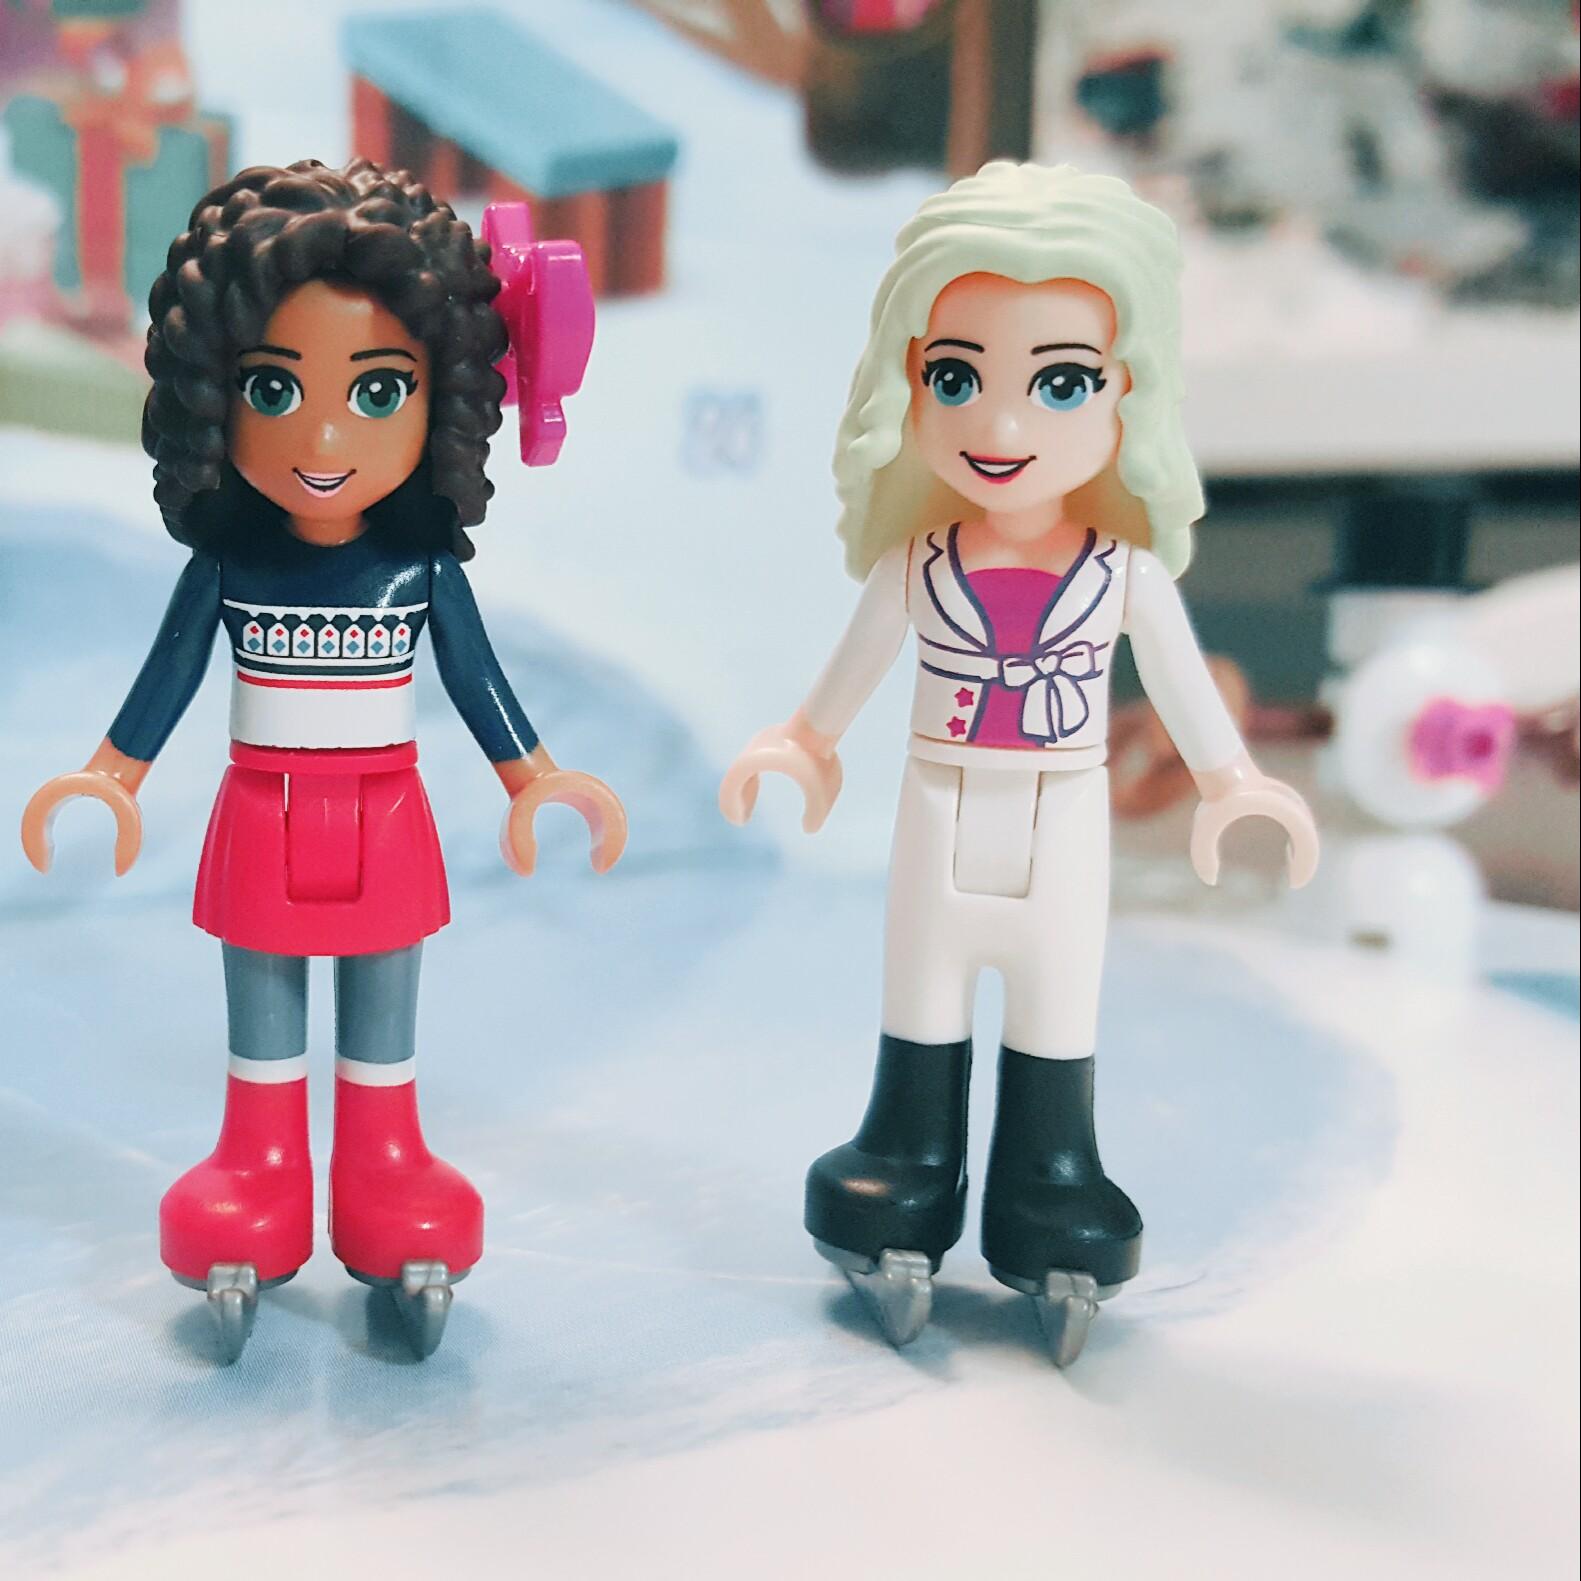 """Wanna skate?"" - Day 5 Liza Minifigure from LEGO Friends Advent Calendar"